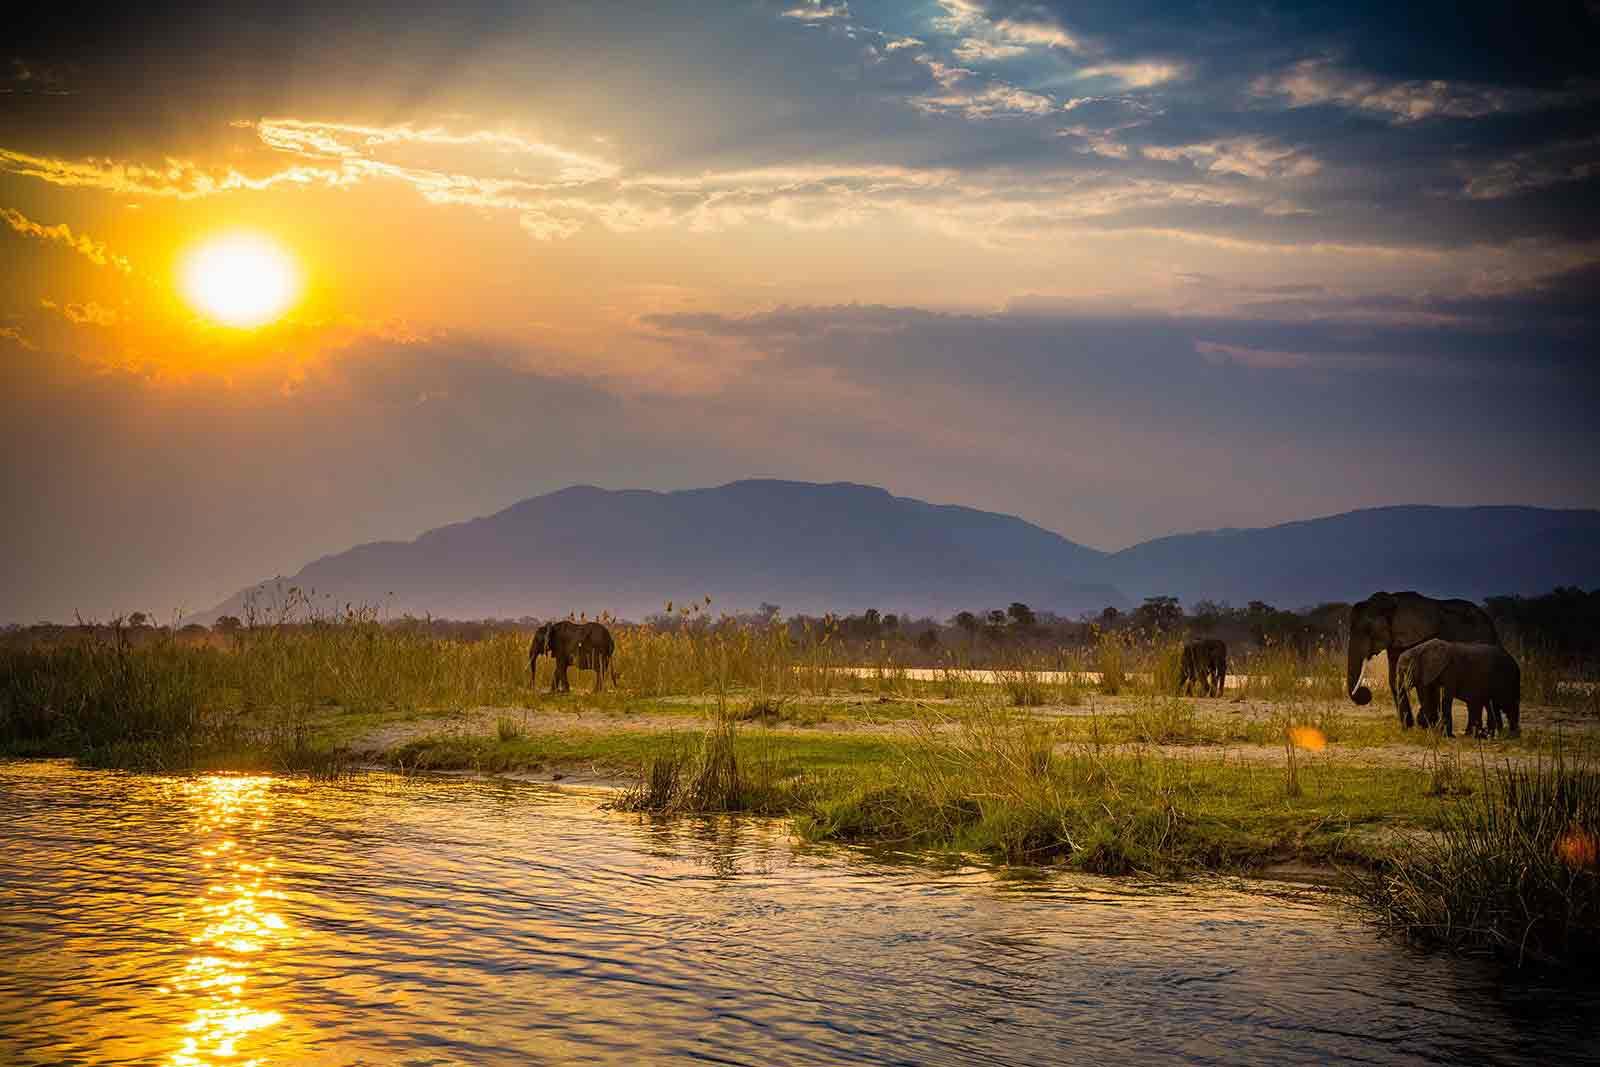 Safari sur le zambèze avec Samsara Voyages